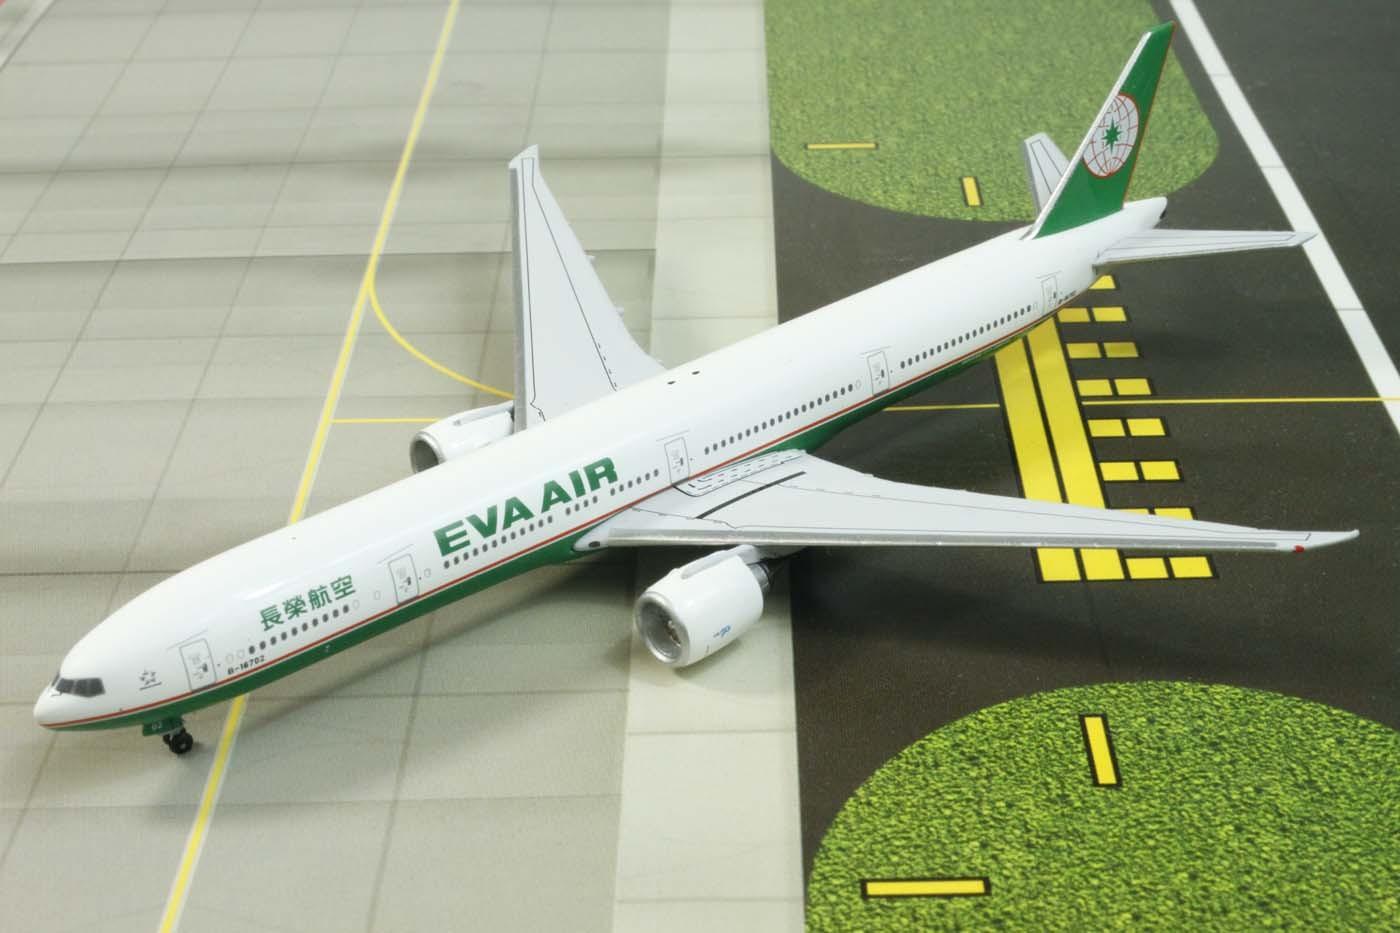 601cbbea3 Highly detailed Aero Classic diecast airplanes EVA Air Boeing 777 ...